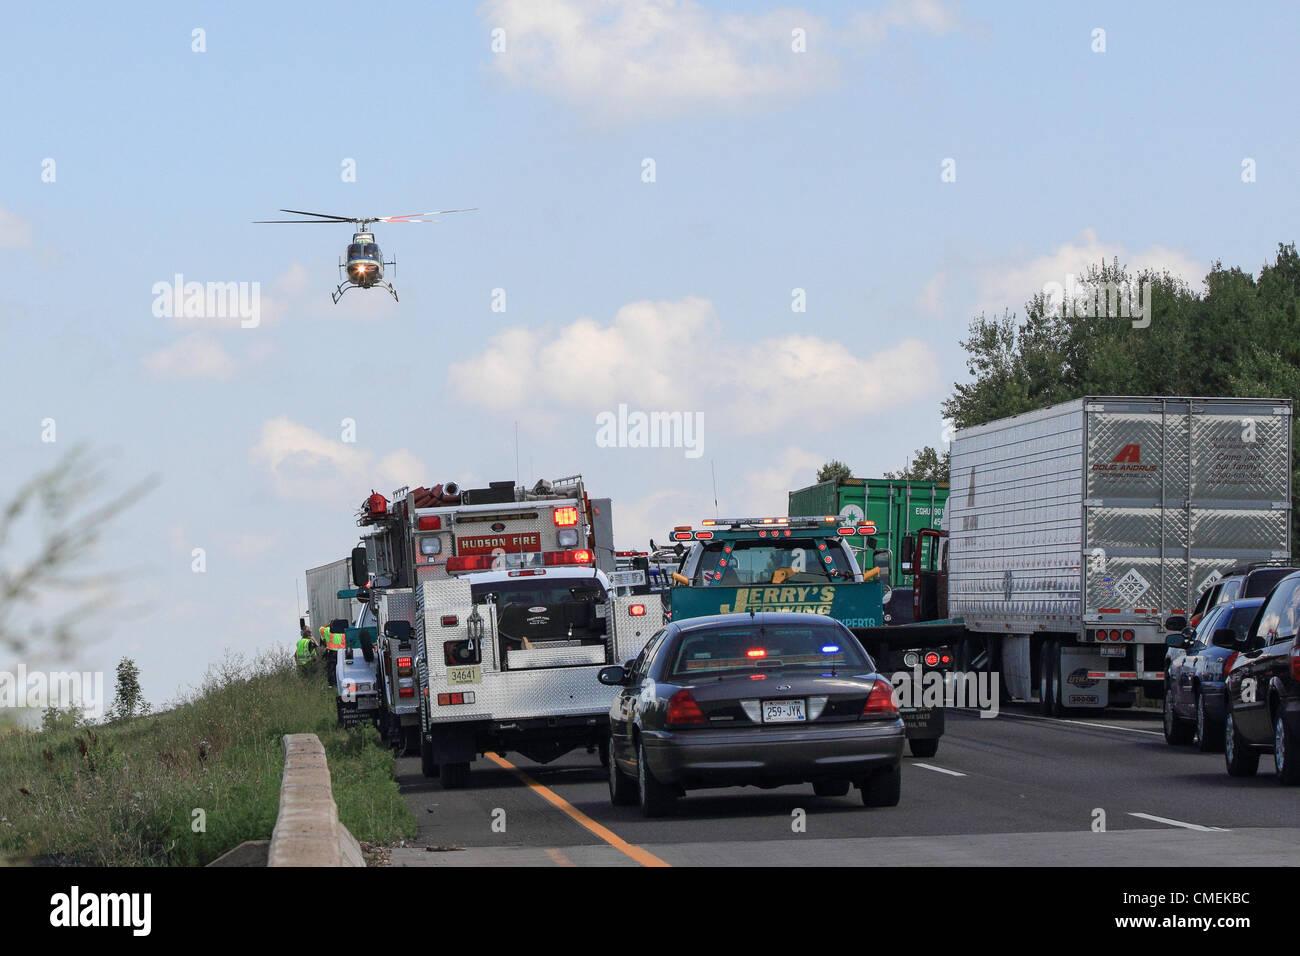 Monday, 30 July, 2012 -- A LifeFlight helicopter transports a victim